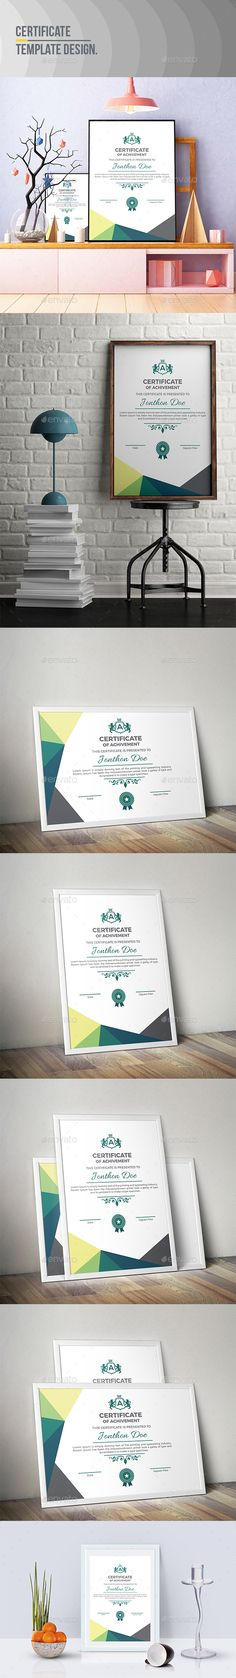 Stationery Printing, Stationery Templates, Stationery Design, Certificate Design, Certificate Templates, Award Certificates, Stencil Templates, Print Templates, Design Templates